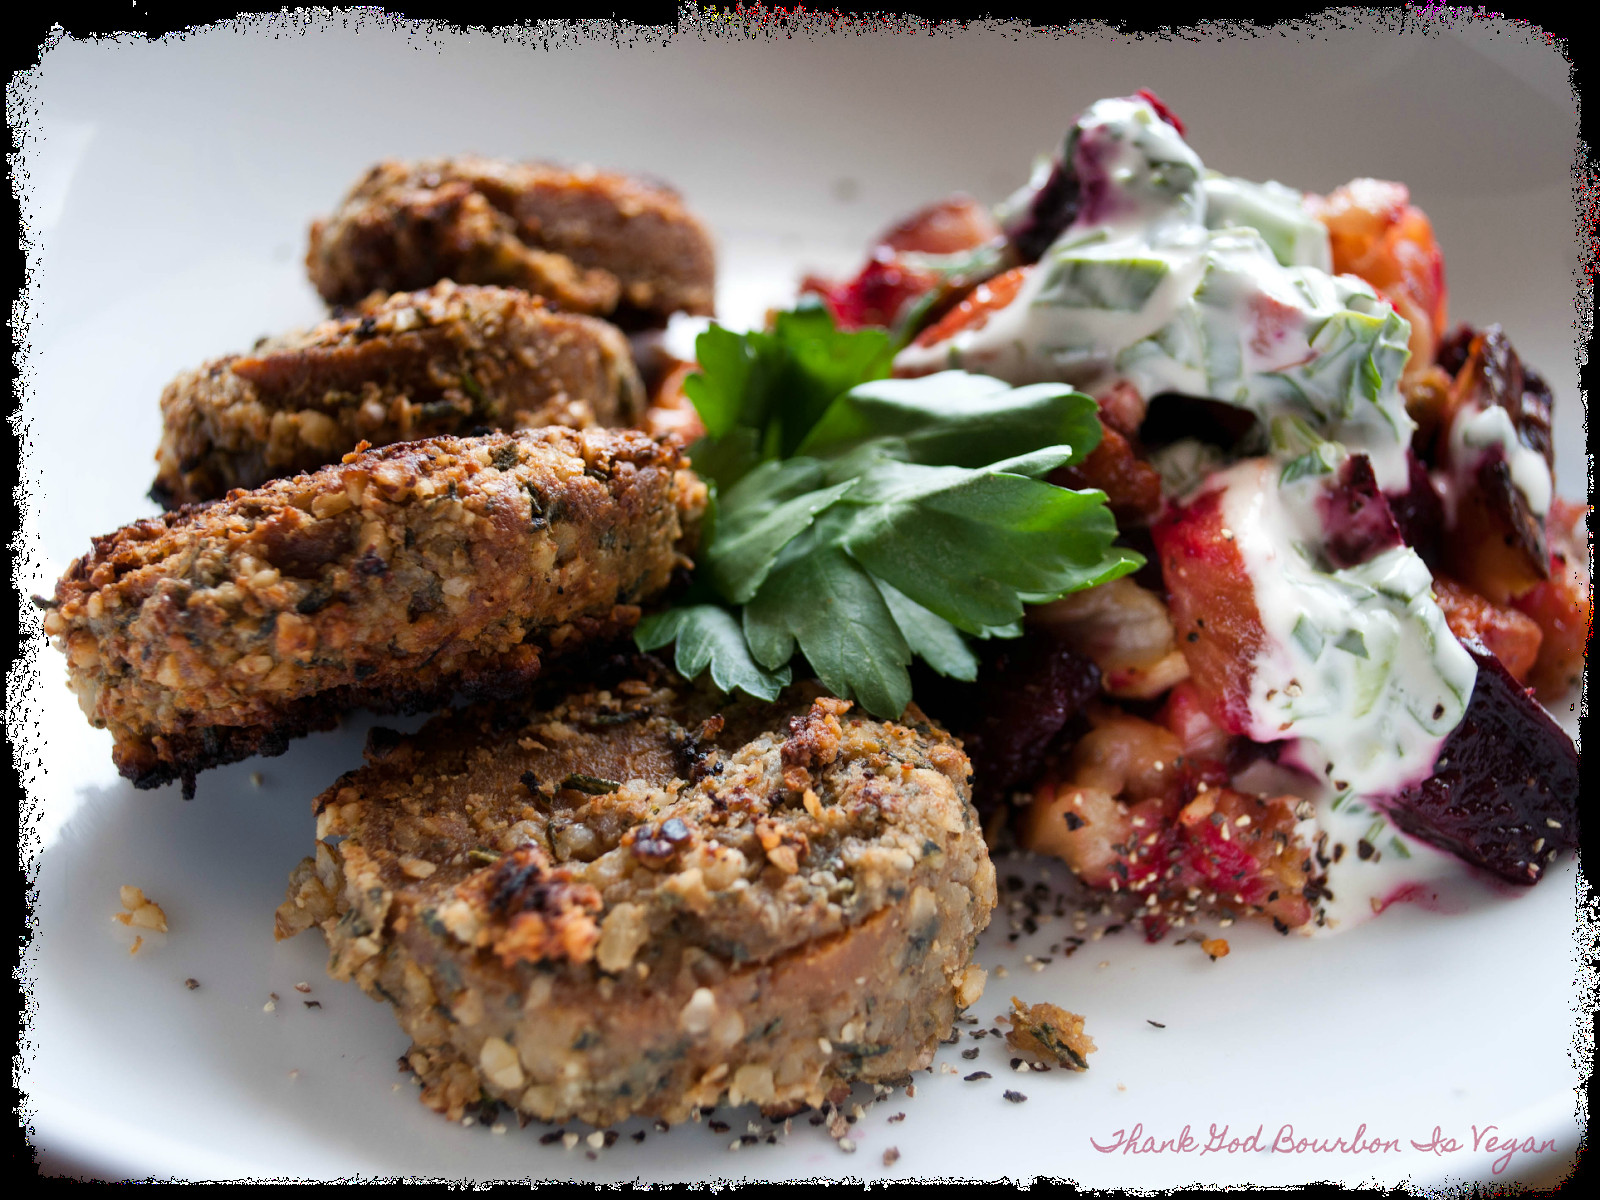 Vegan Easter Dinner Ideas  Thank God Bourbon is Vegan Walnut Herb Crusted Seitan